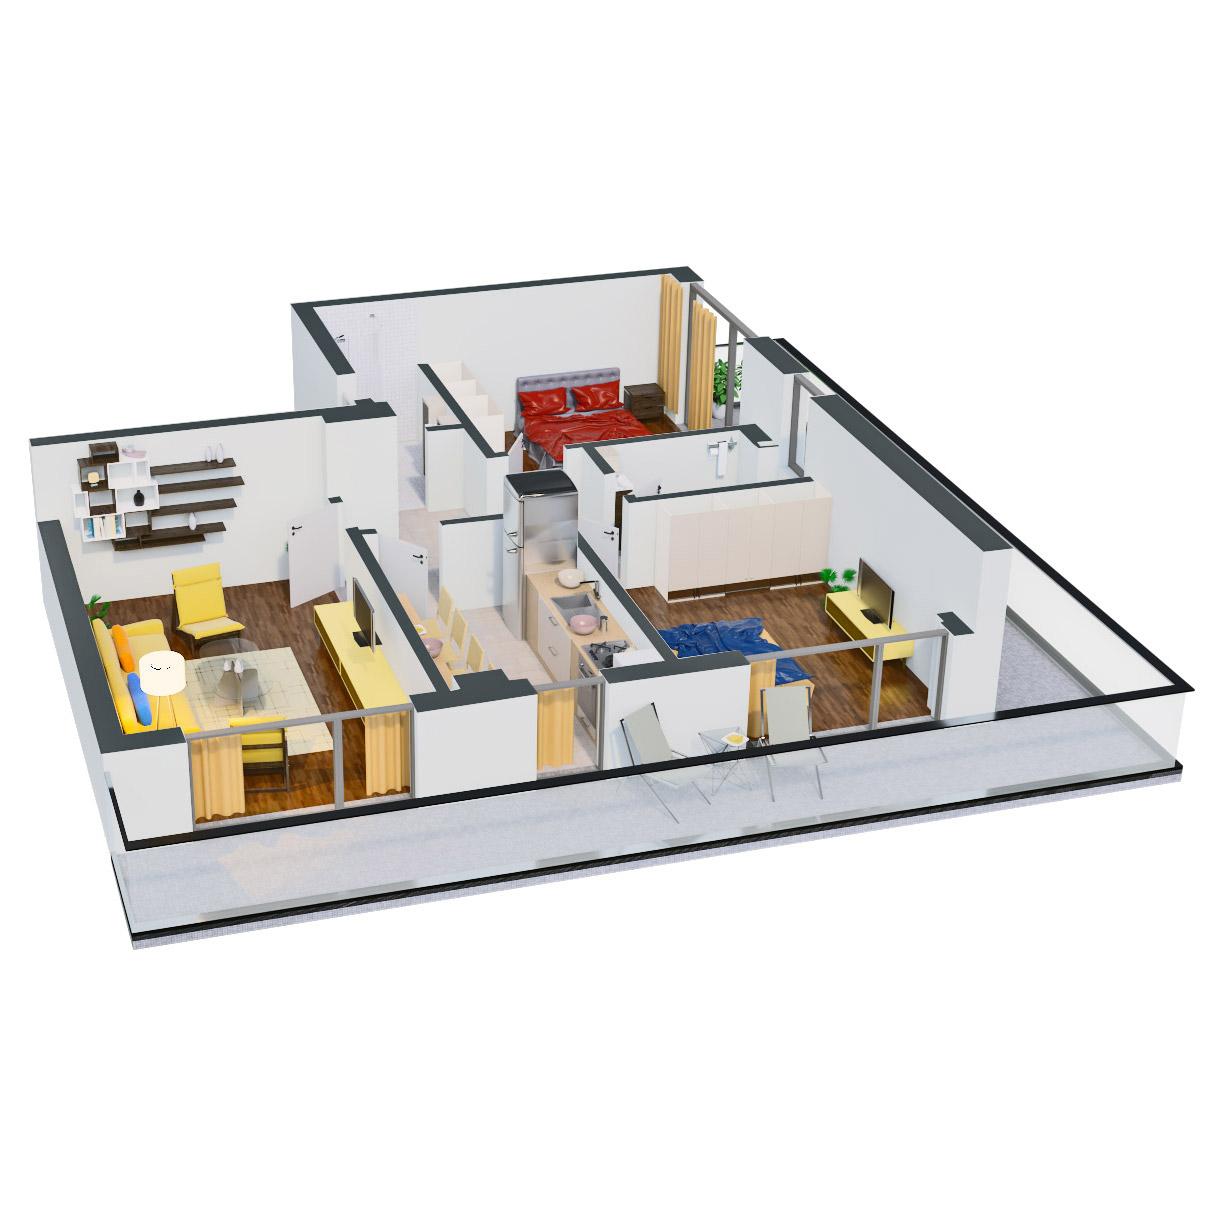 Apartament 3 camere de vanzare Bucuresti - Catedral Residence - Marriott, Piata Unirii, 13 Septembrie, Izvor - Tip 6 - T2A - D